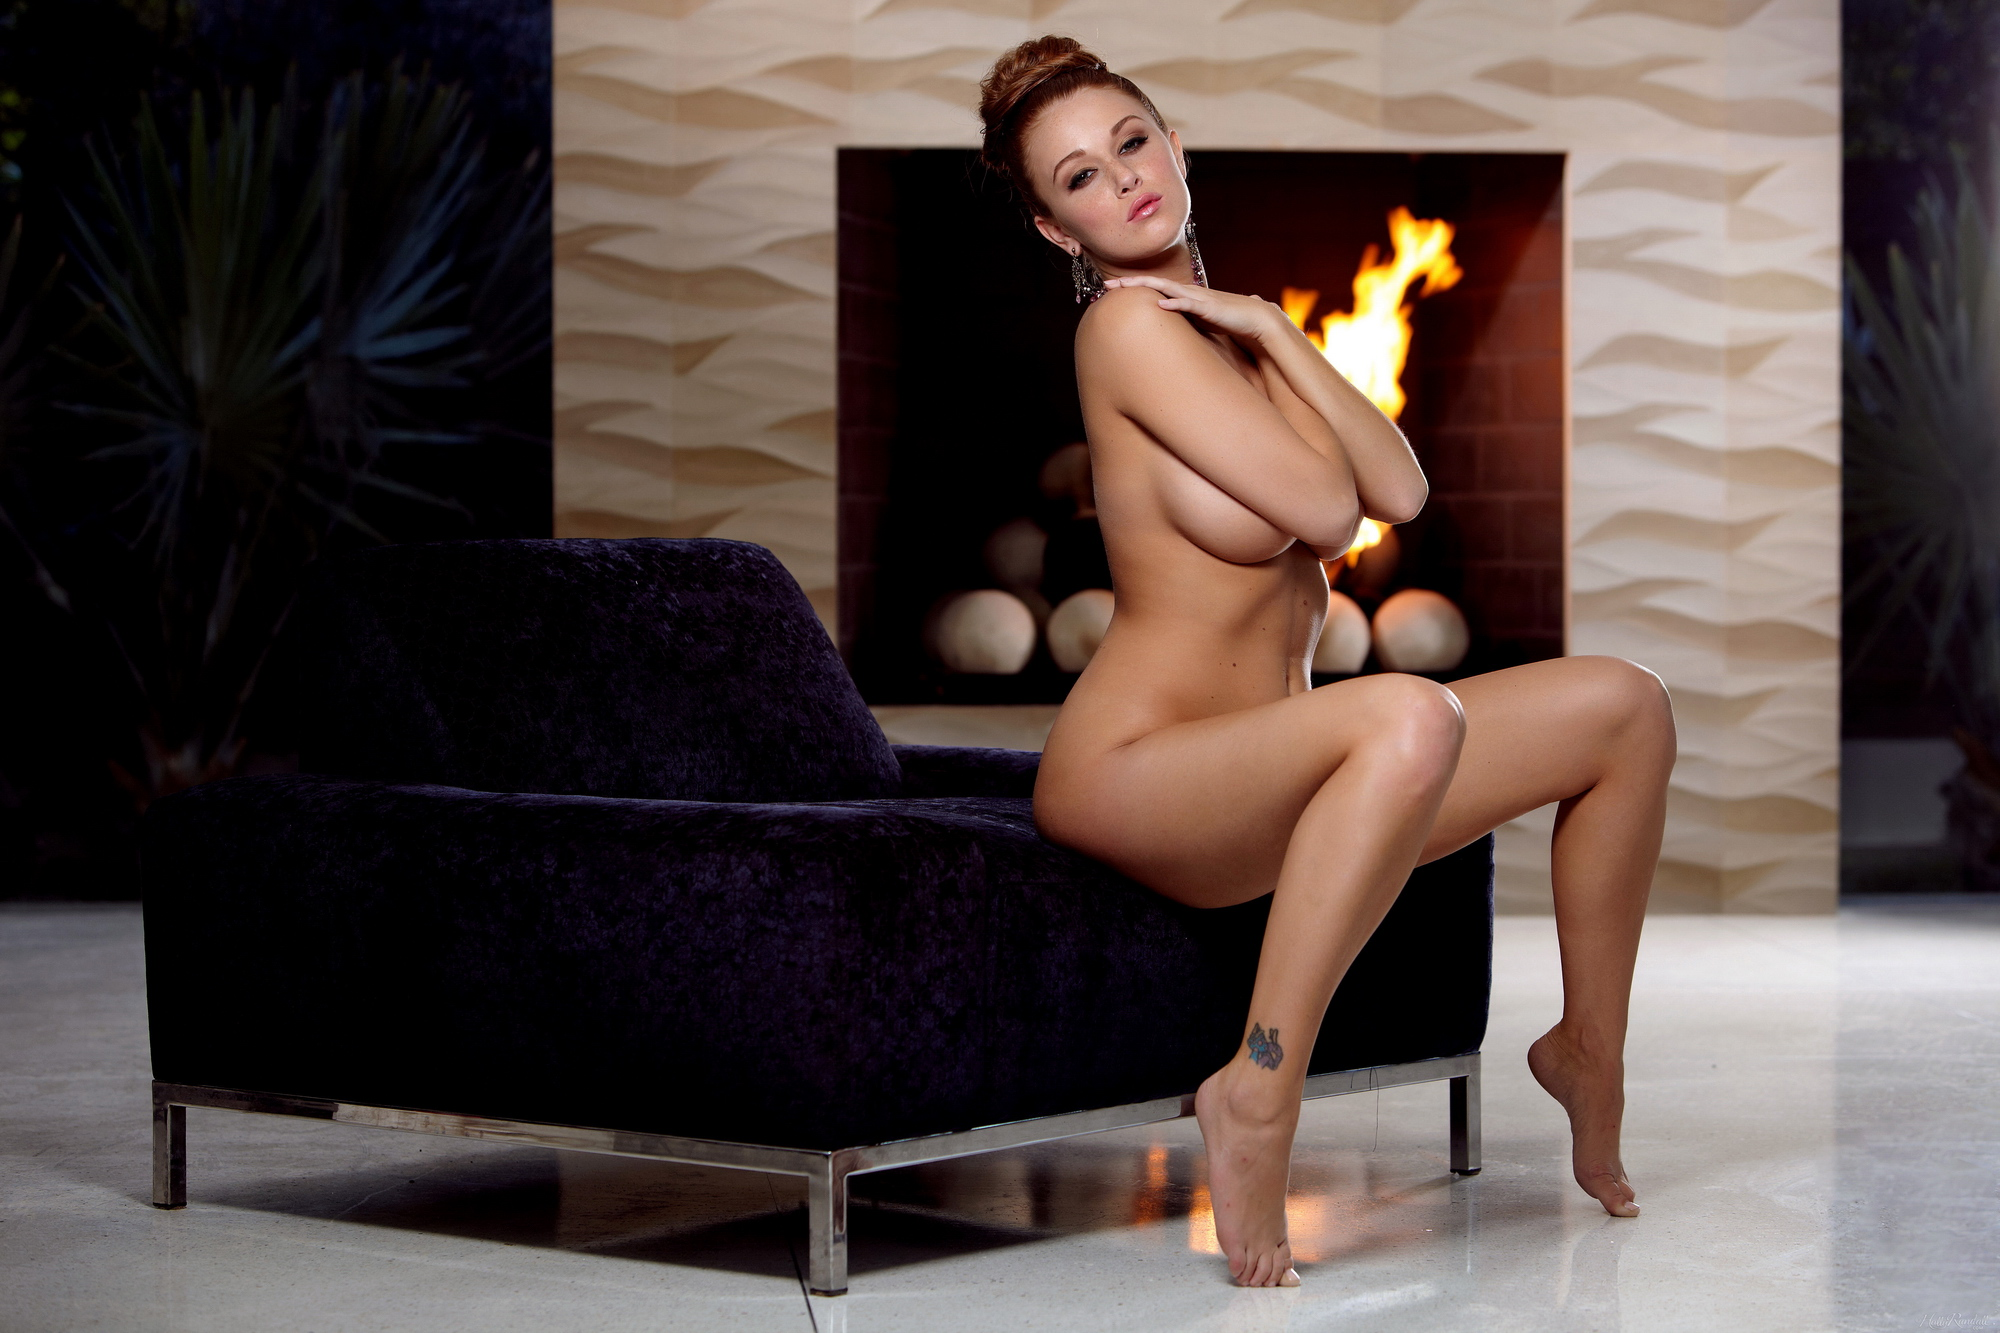 leanna-decker-nude-fireplace-redhead-hollyrandall-25